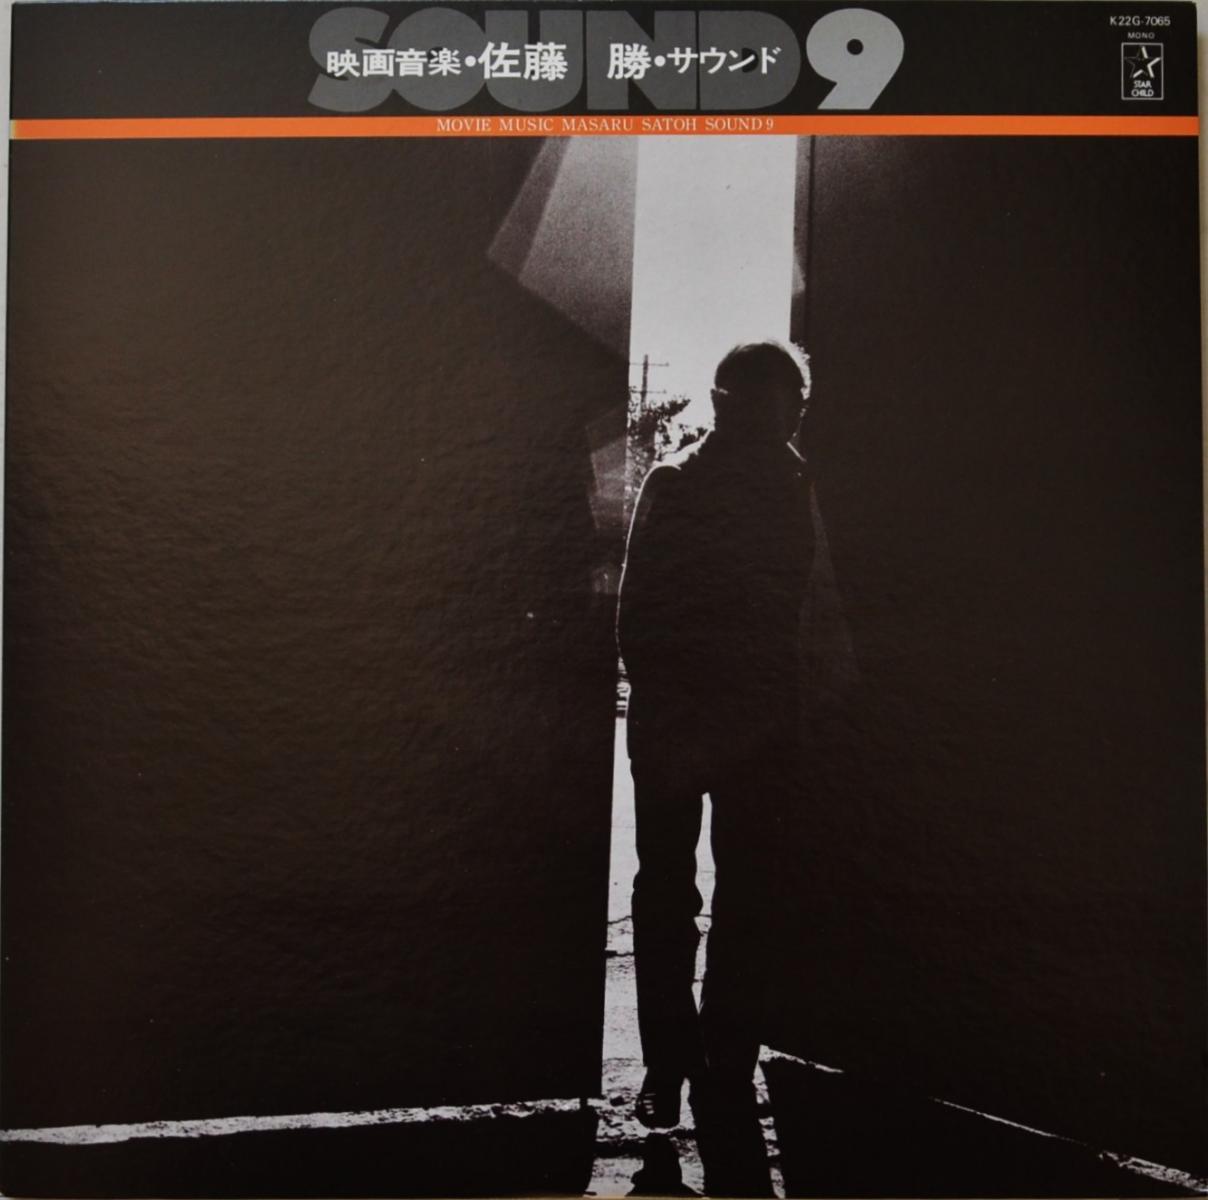 佐藤勝 MASARU SATOH / 映画音楽・佐藤勝・サウンド 9 (MOVIE MUSIC MASARU SATOH SOUND 9) (LP)